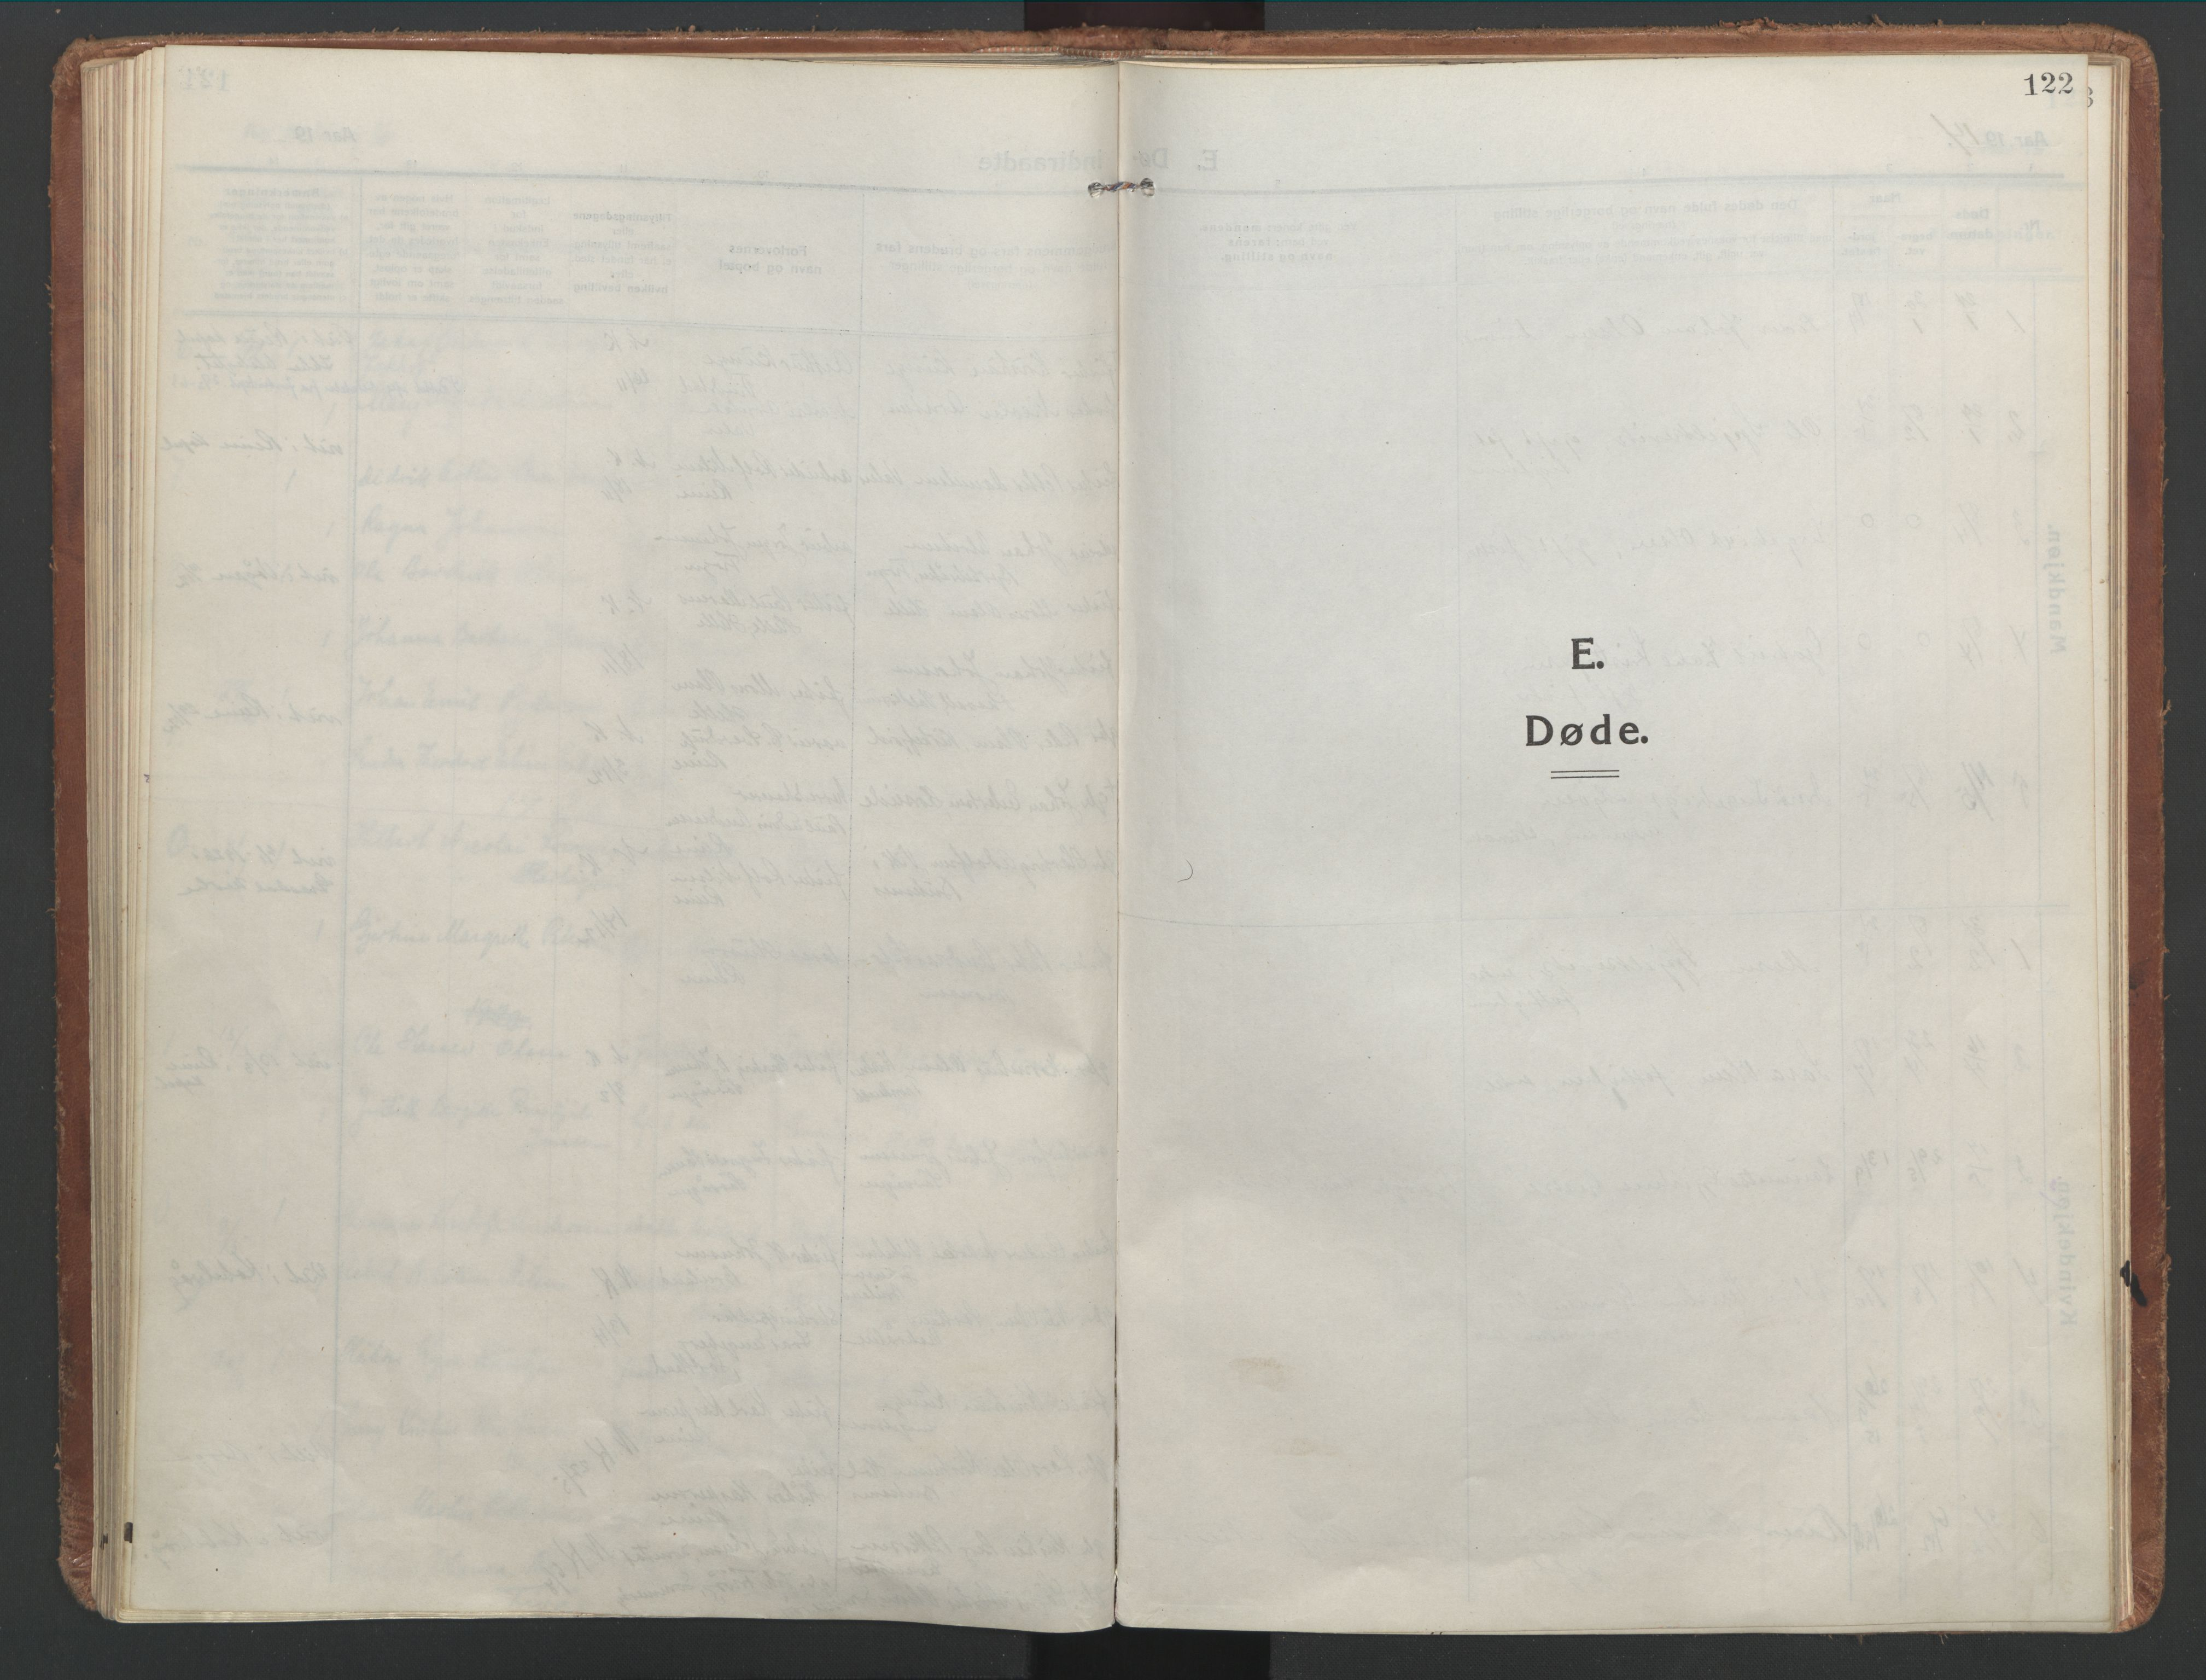 SAT, Ministerialprotokoller, klokkerbøker og fødselsregistre - Nordland, 886/L1222: Ministerialbok nr. 886A04, 1914-1926, s. 122